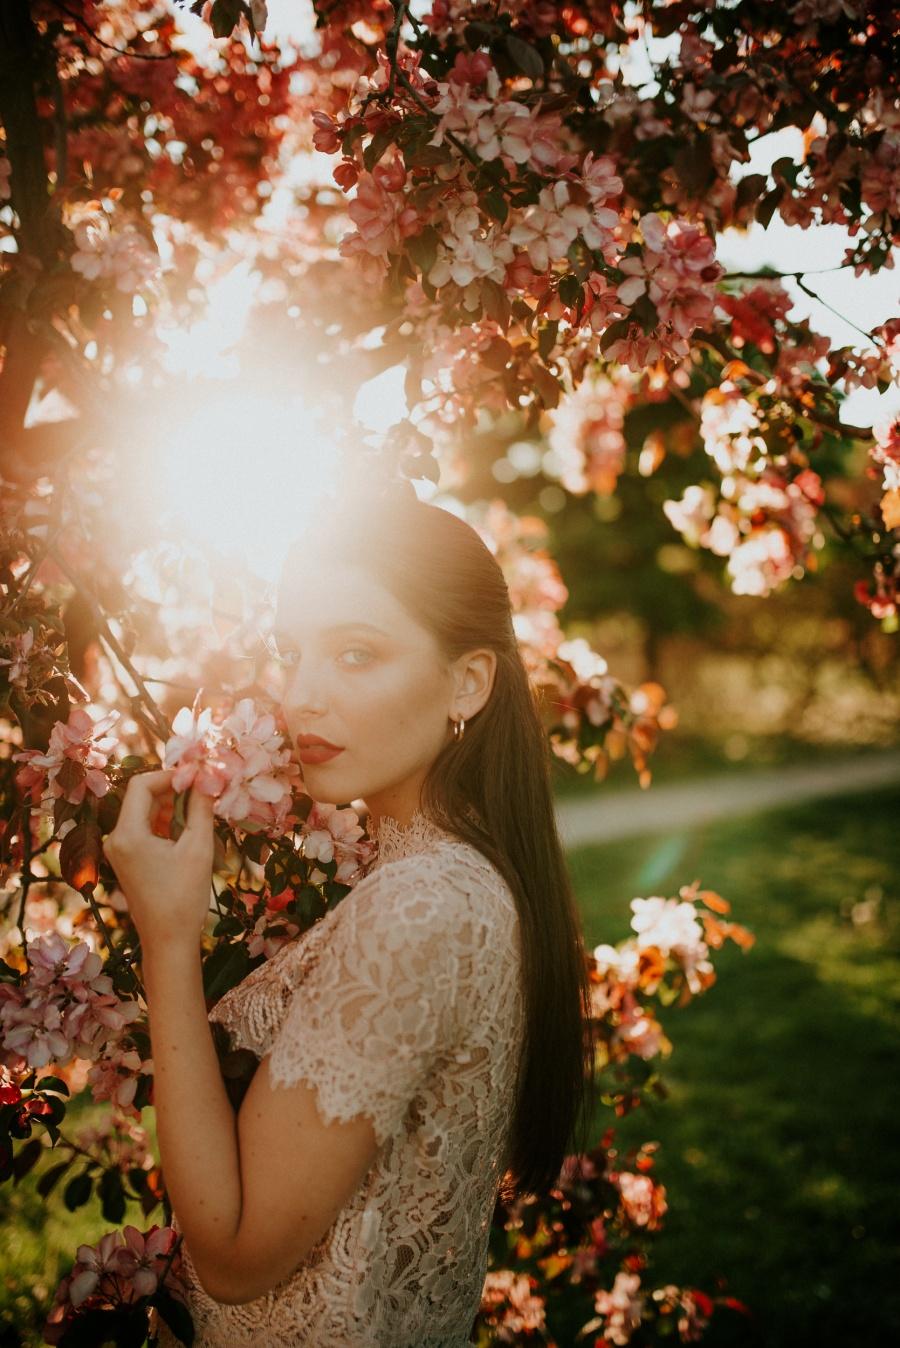 julia wiszniewska fotografia